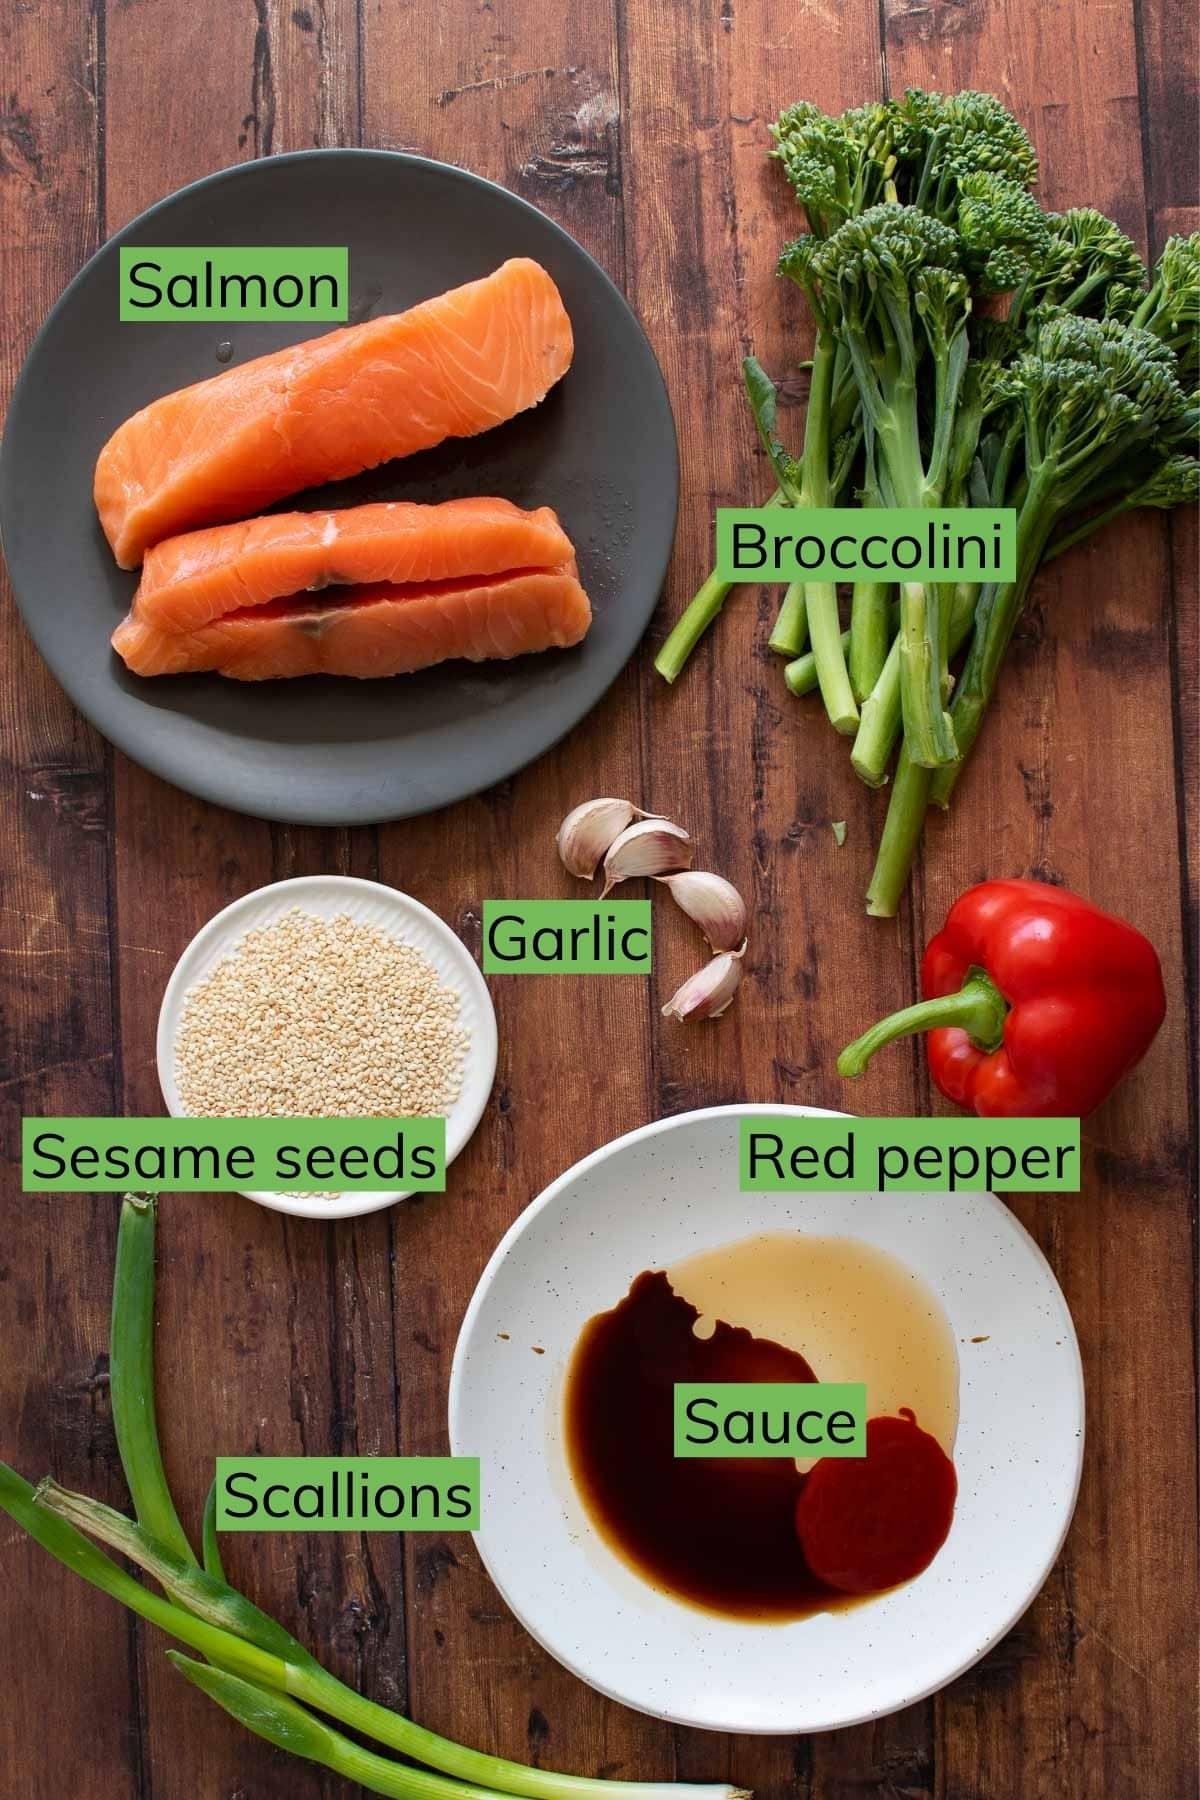 Ingredients to make a salmon stir fry.